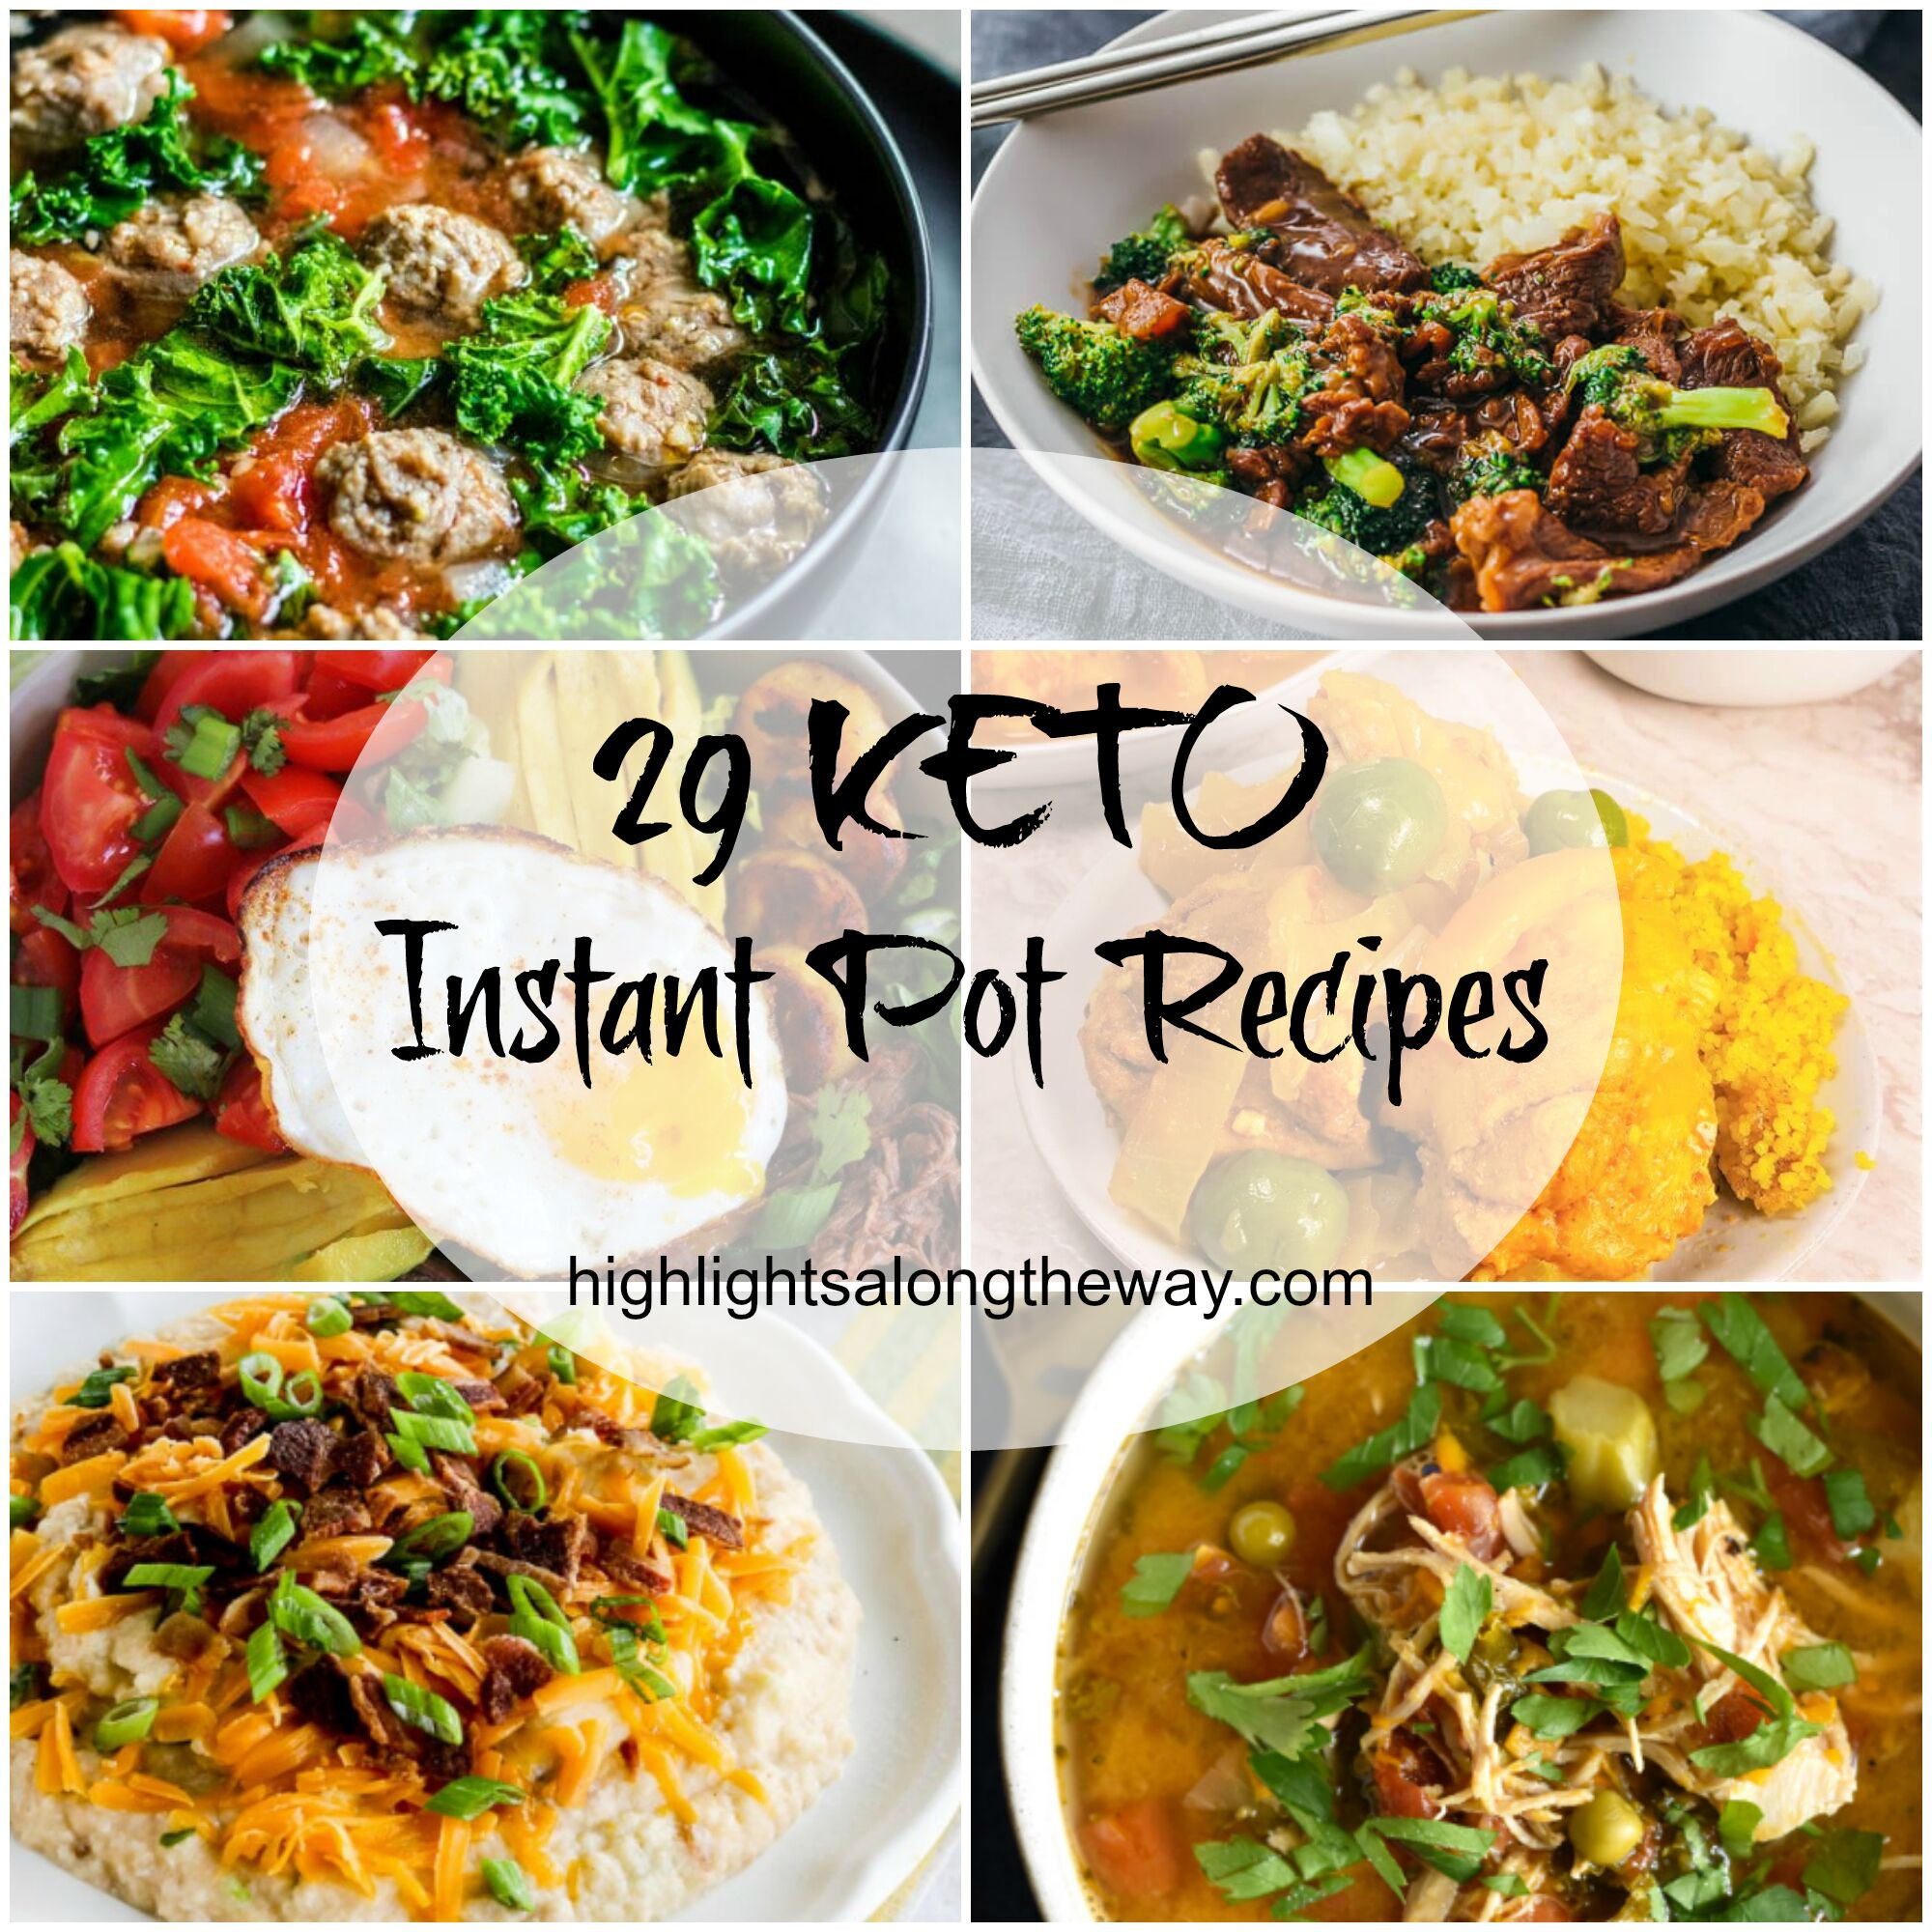 Instant Pot Keto Recipes  Easy Keto Instant Pot Recipes Roundup of 29 Easy Keto